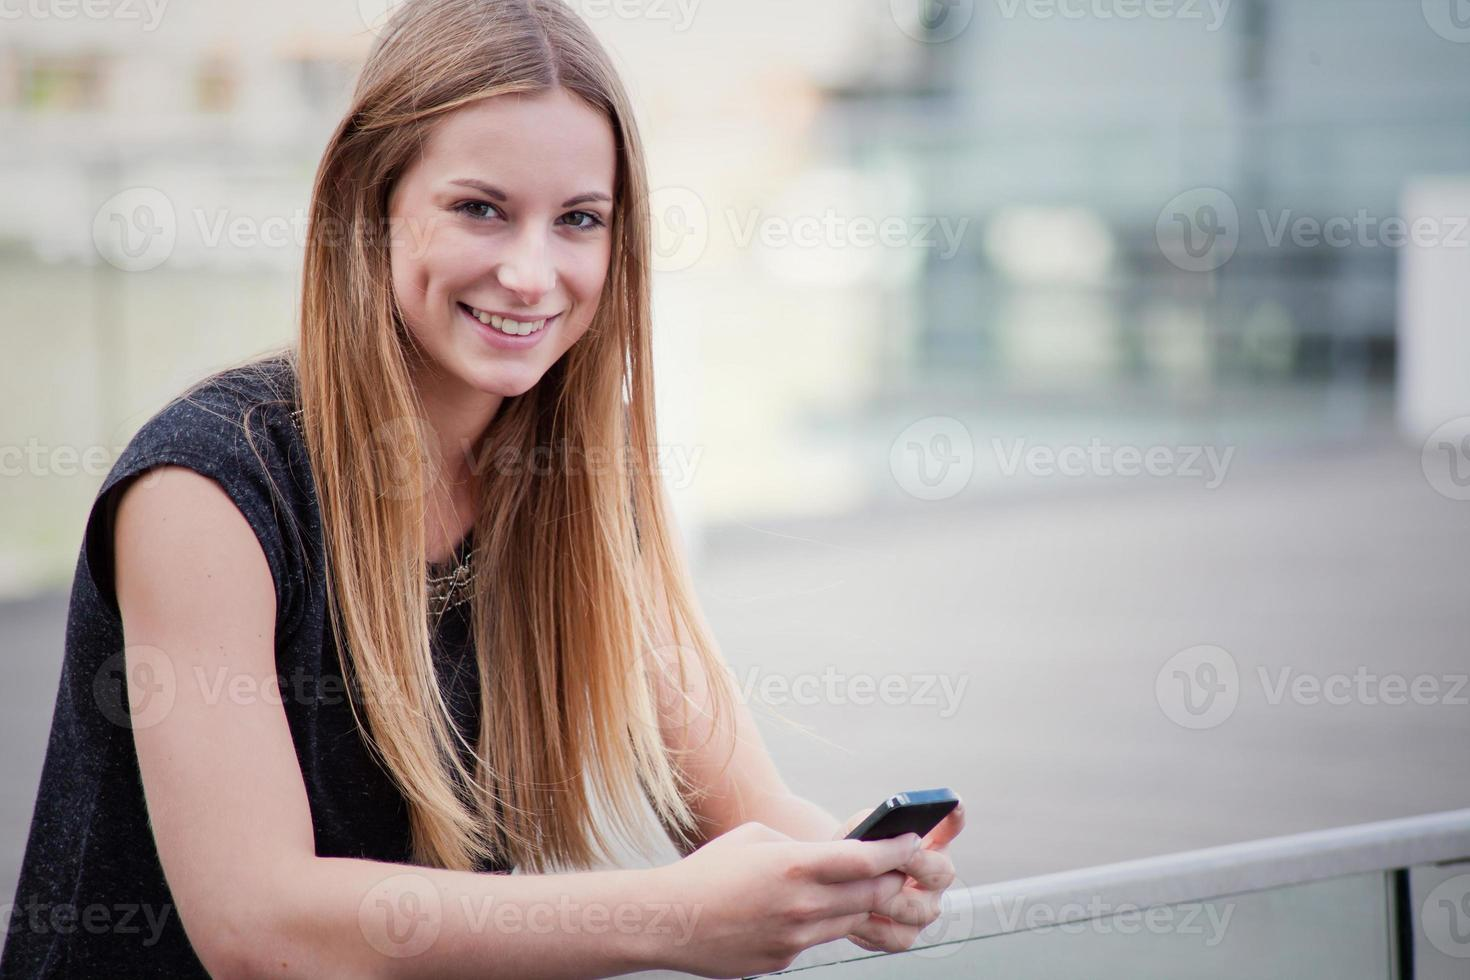 adolescente usando teléfono inteligente foto